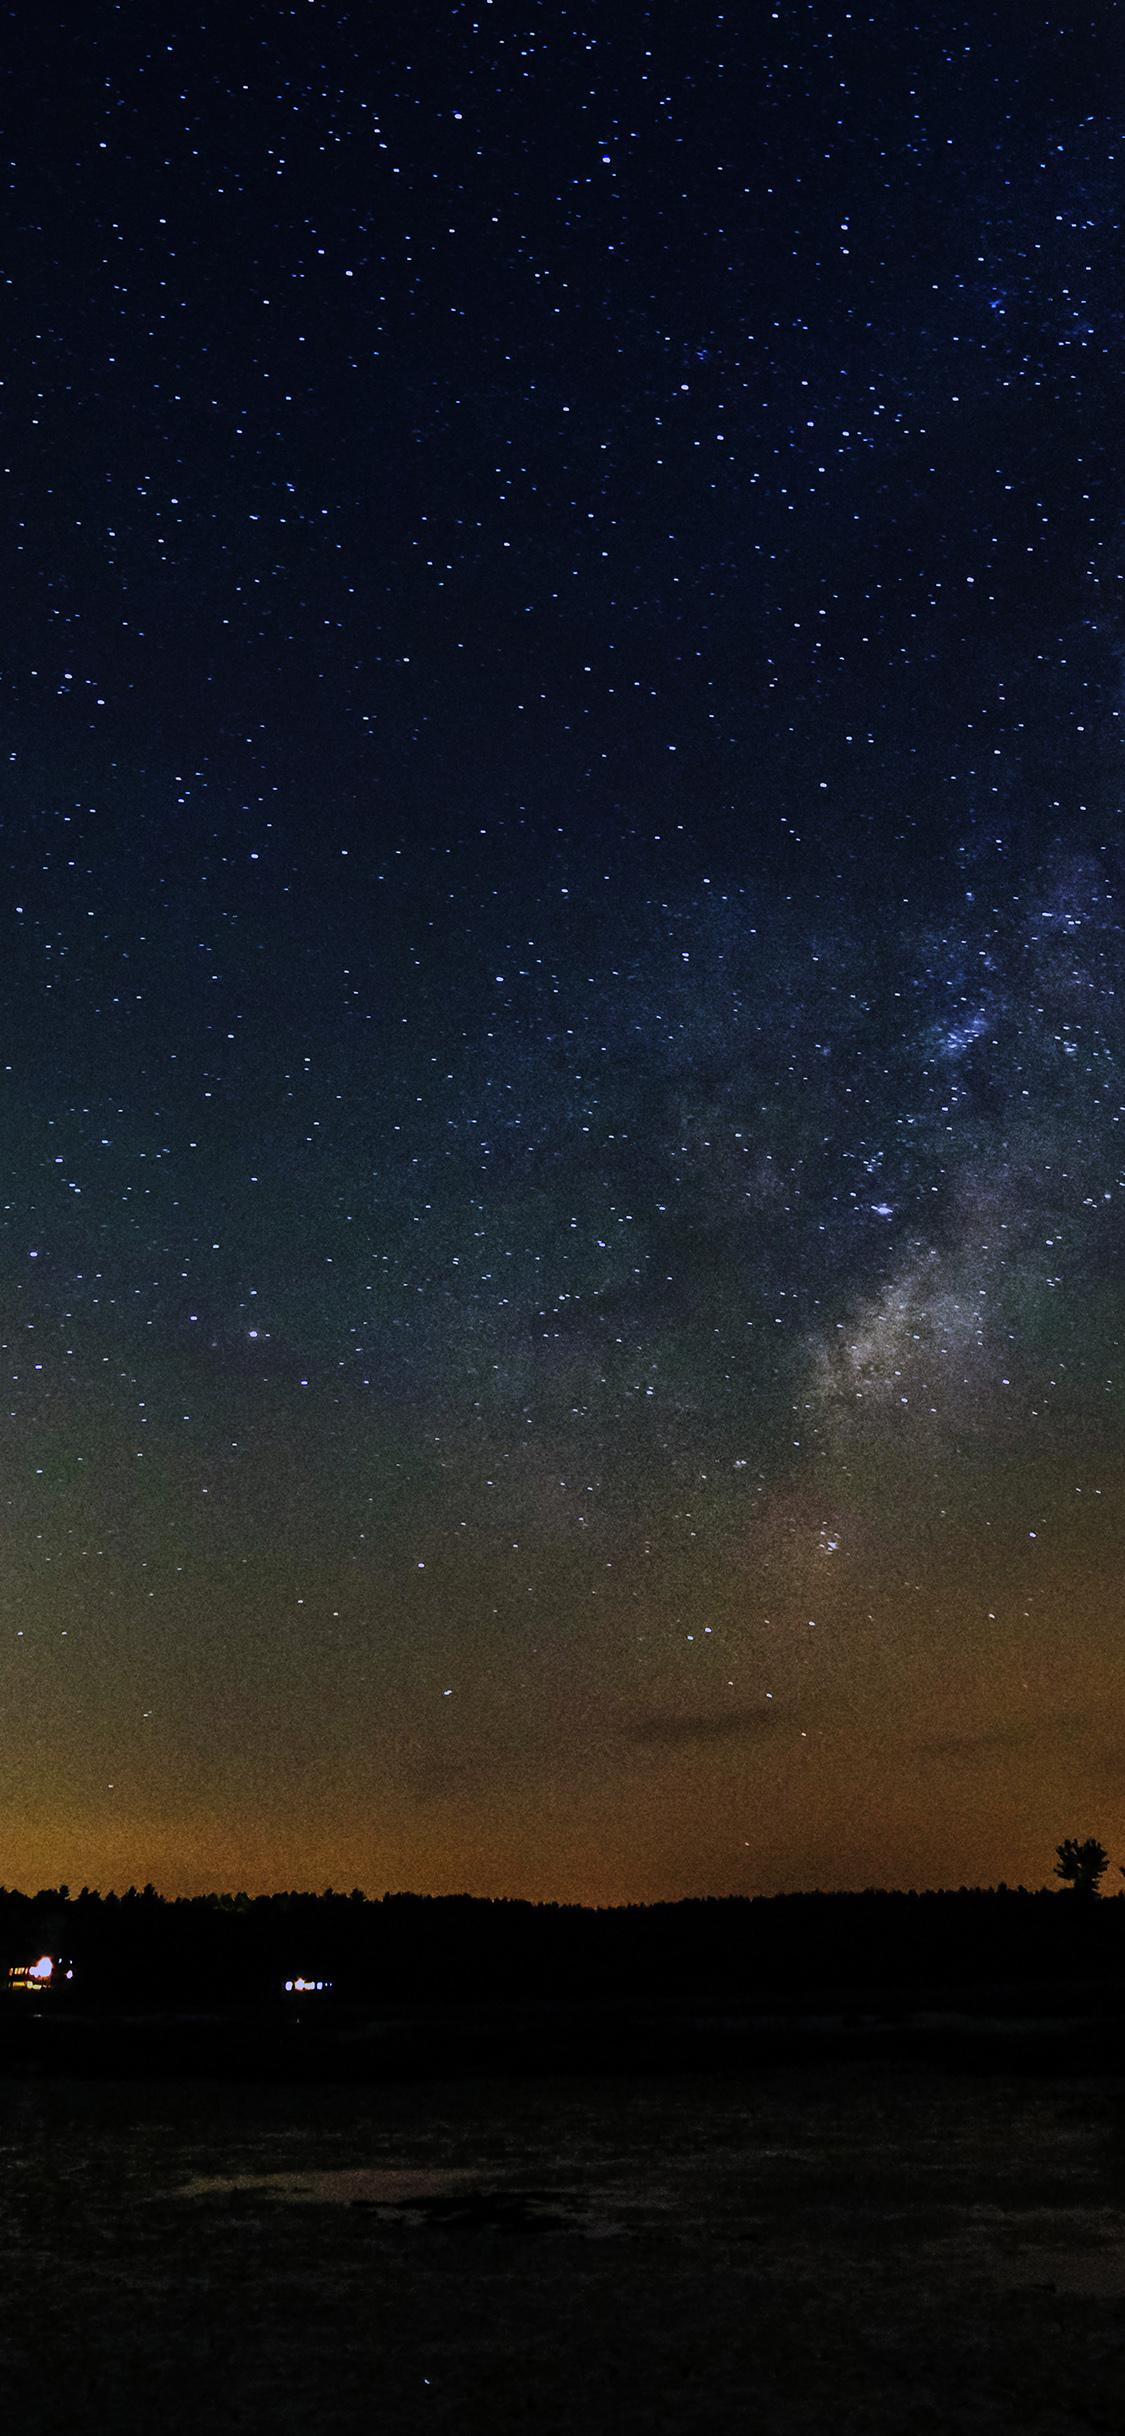 iPhonexpapers.com-Apple-iPhone-wallpaper-nk52-night-sky-star-starry-romantic-blue